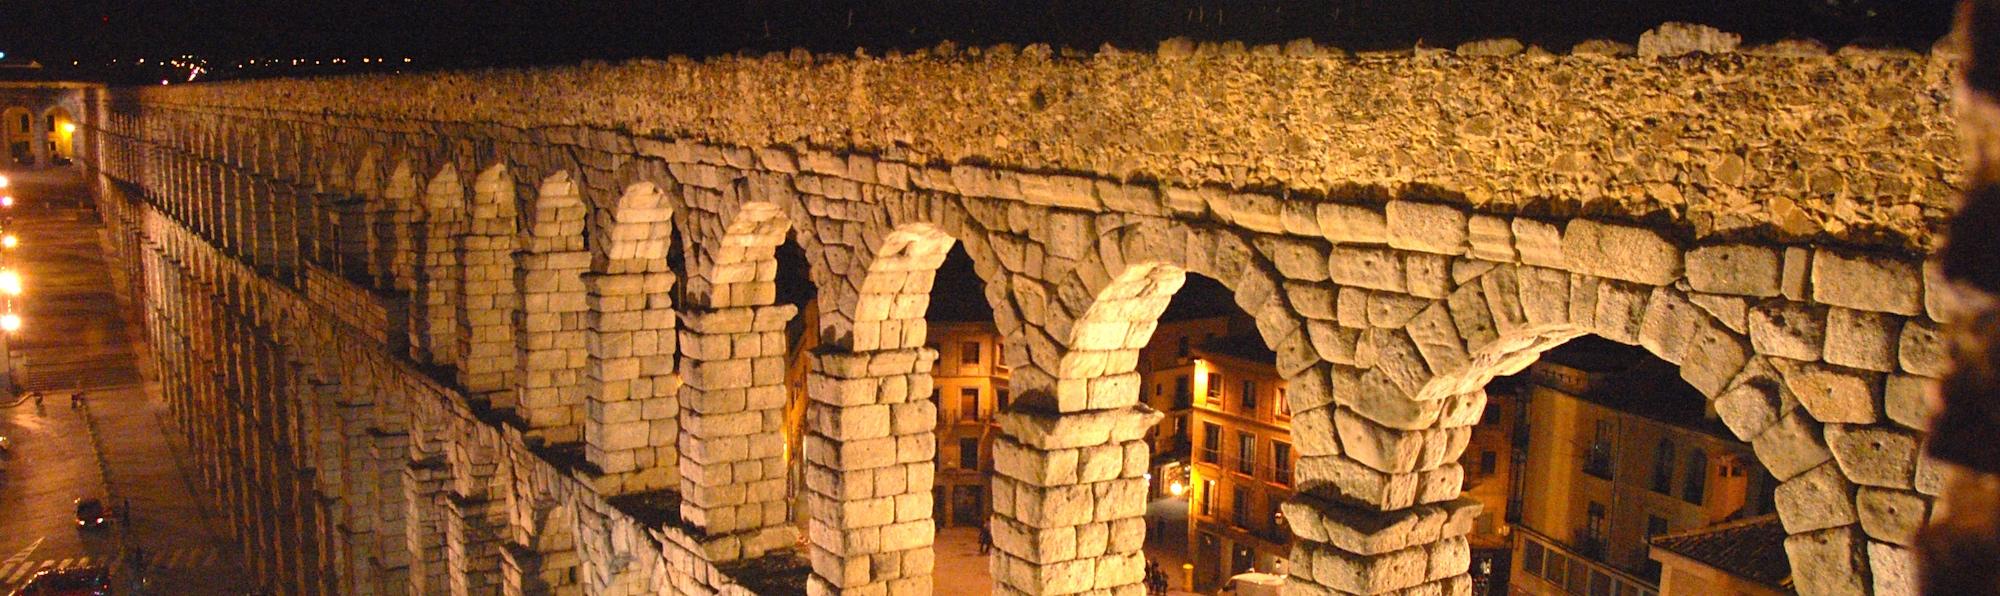 Acueducto Romano, Segovia, España